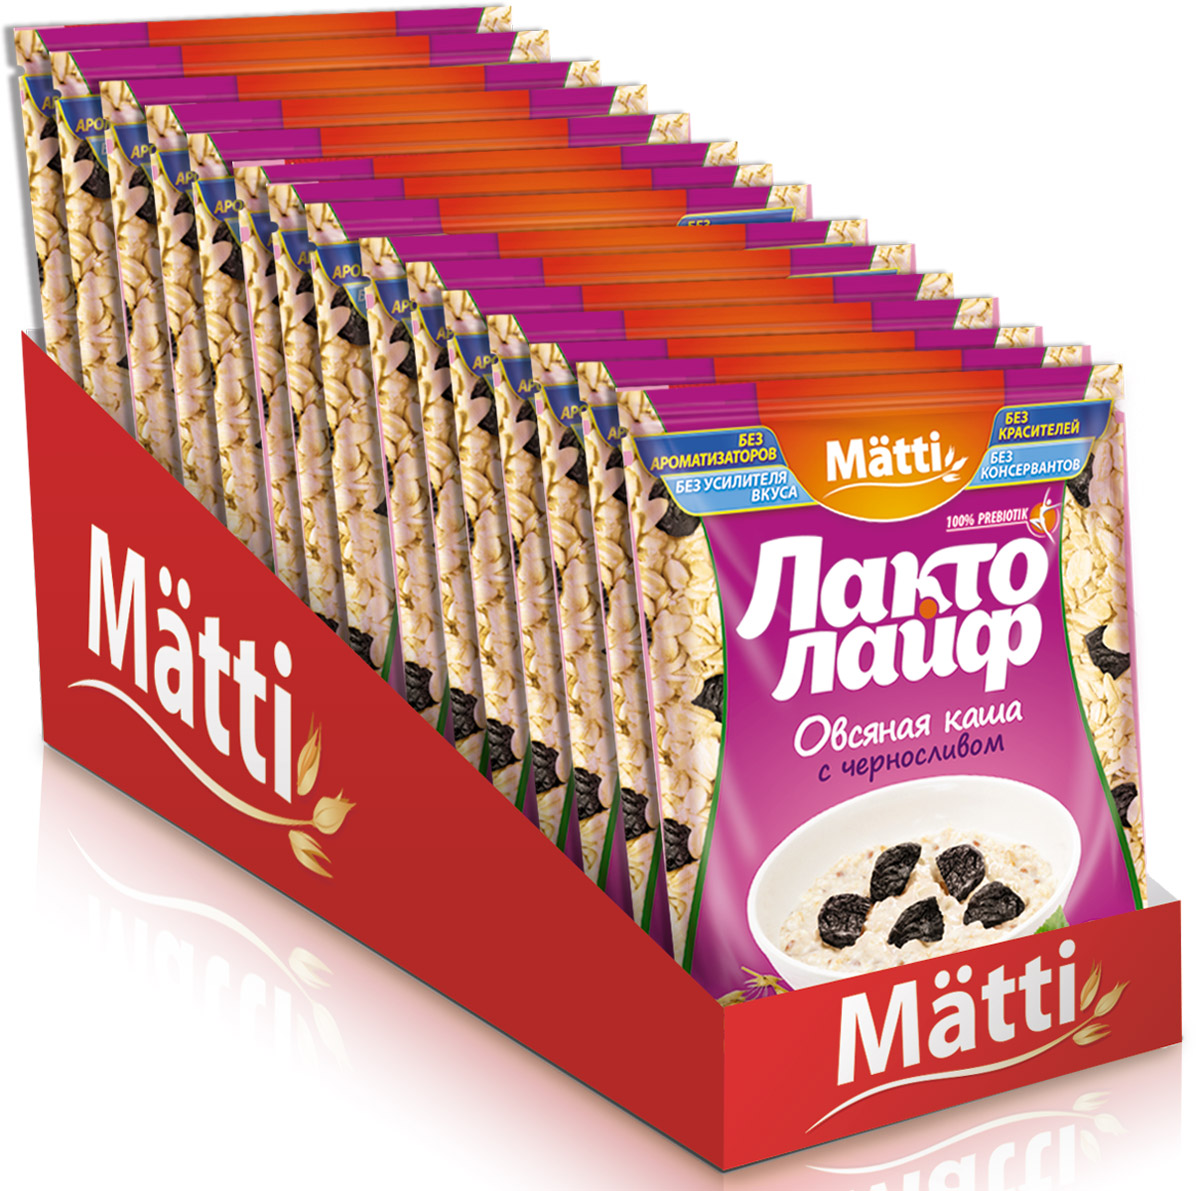 Лактолайф каша с черносливом, 15 шт по 40 г matti каша малина со сливками 15 шт по 40 г